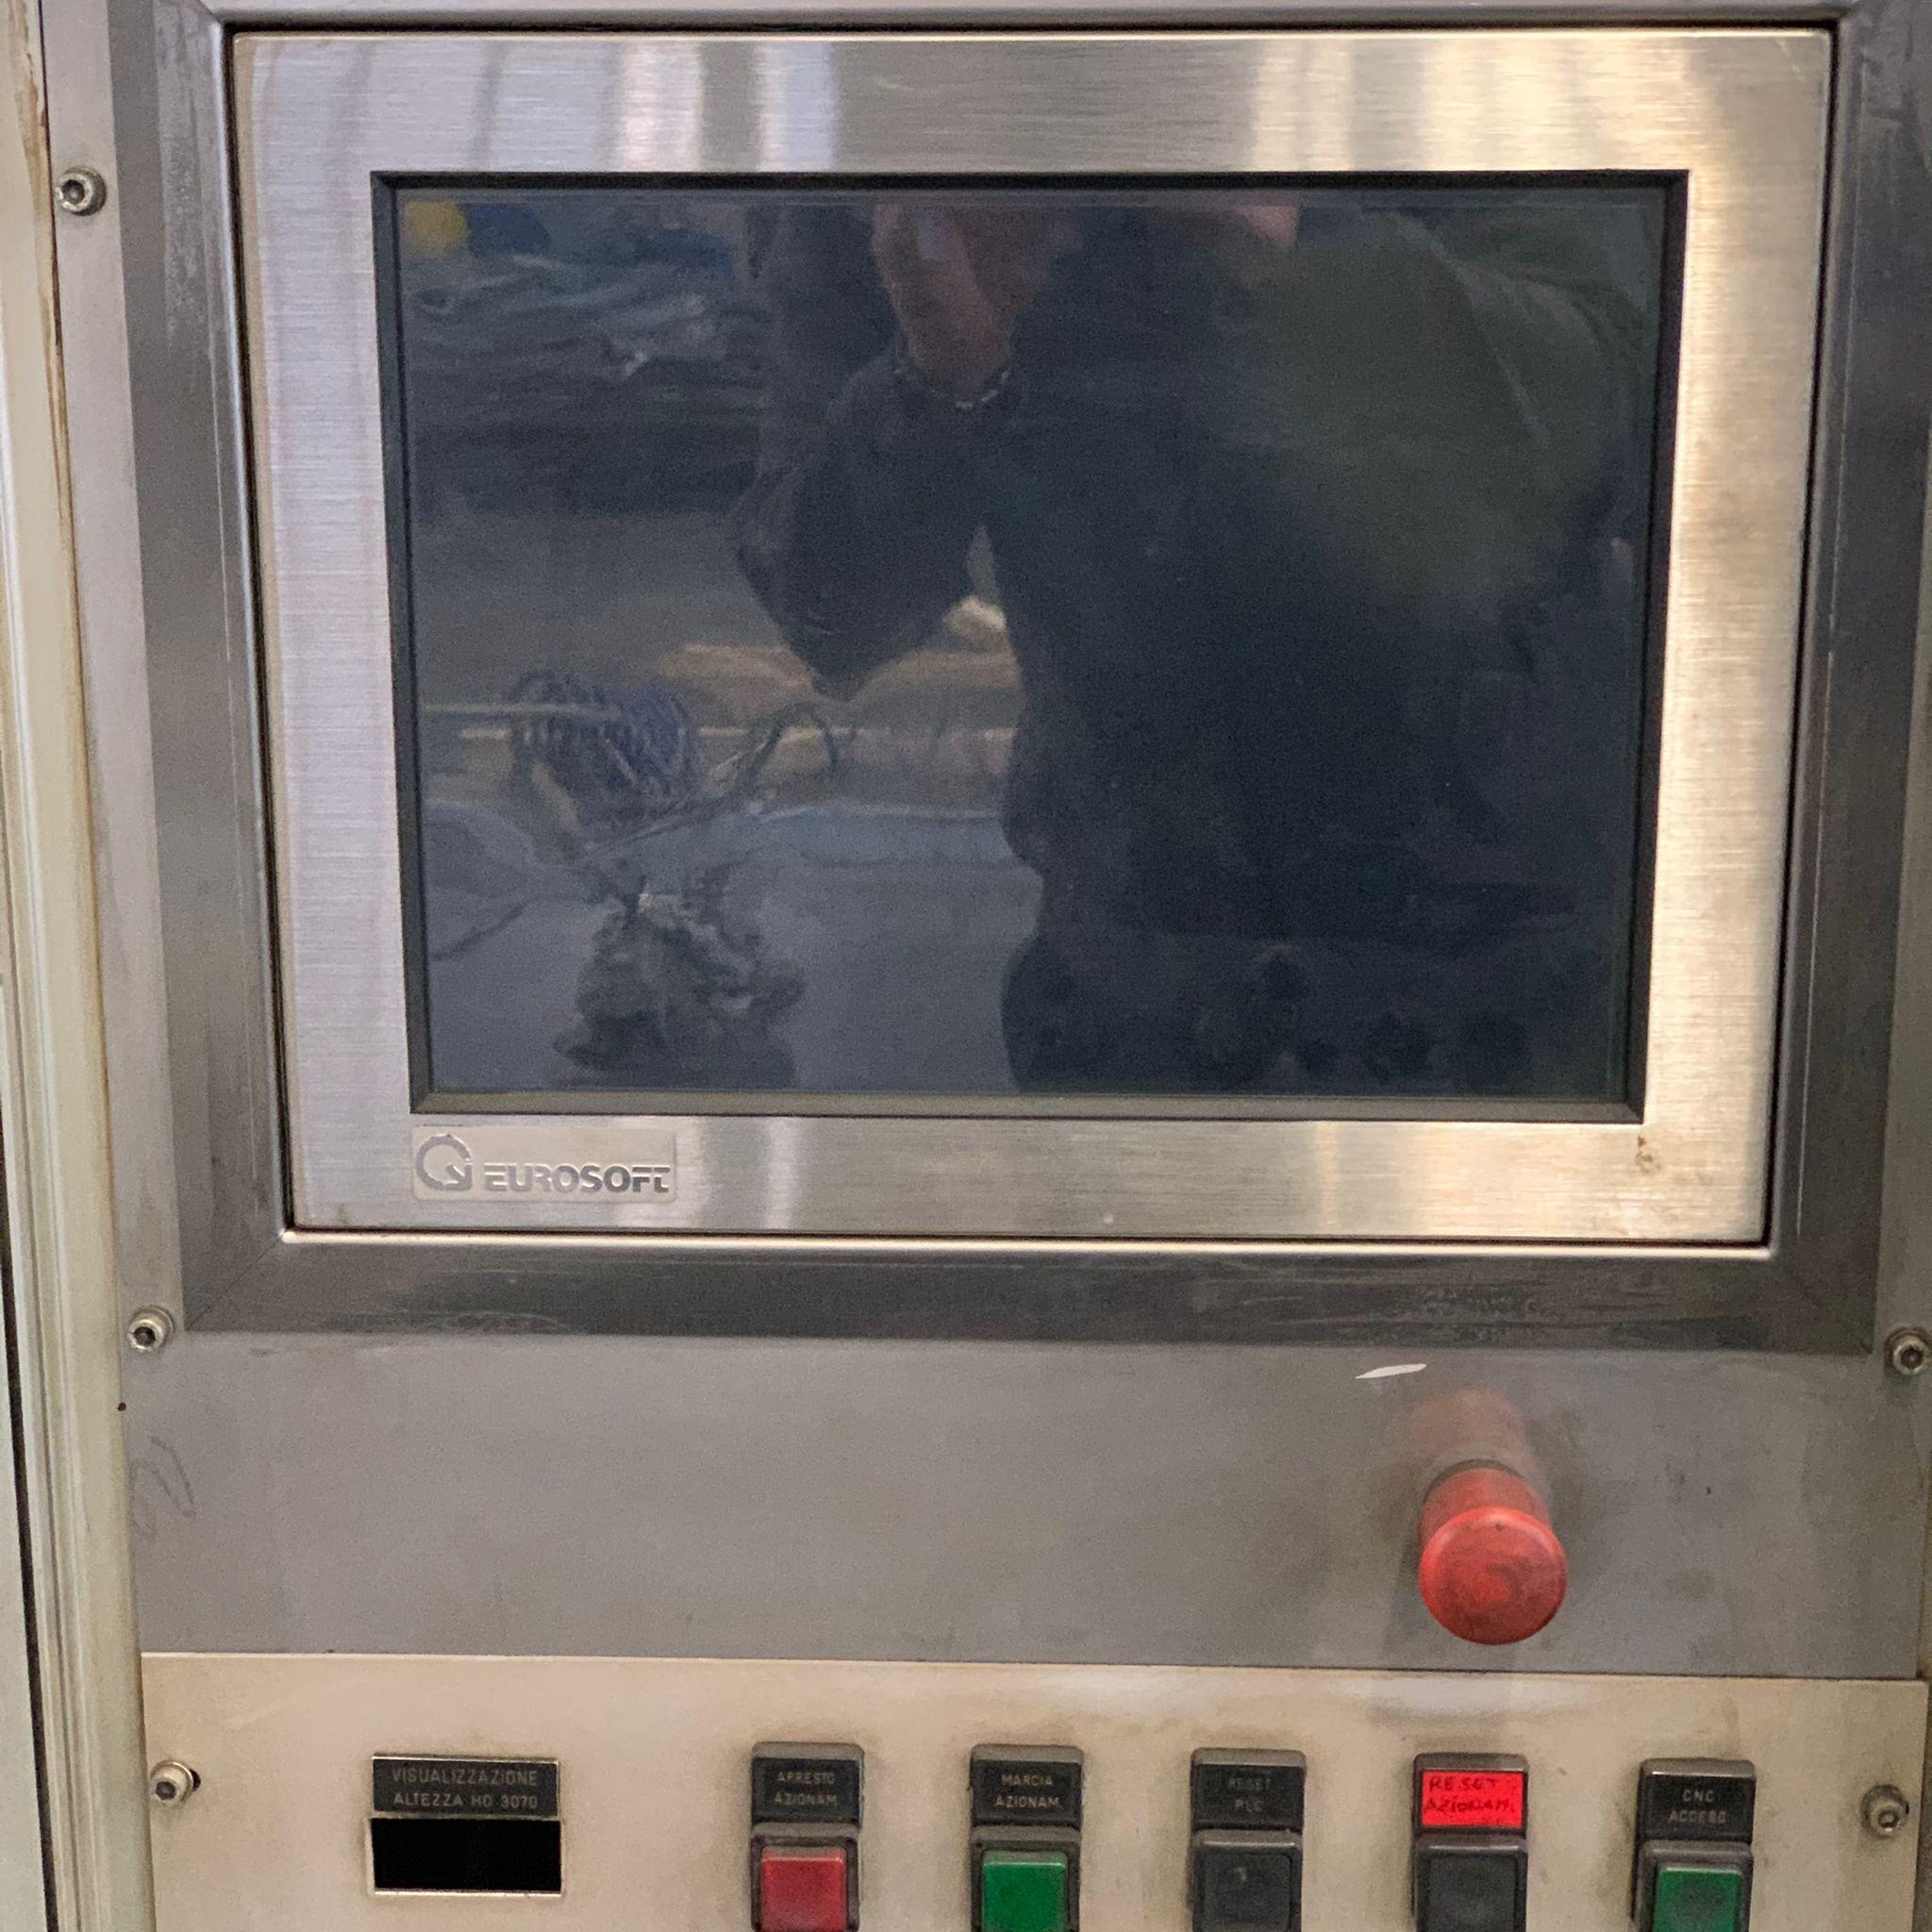 Taglio plasma CMR 12000 x 2500 mm 260 amp in vendita - foto 3